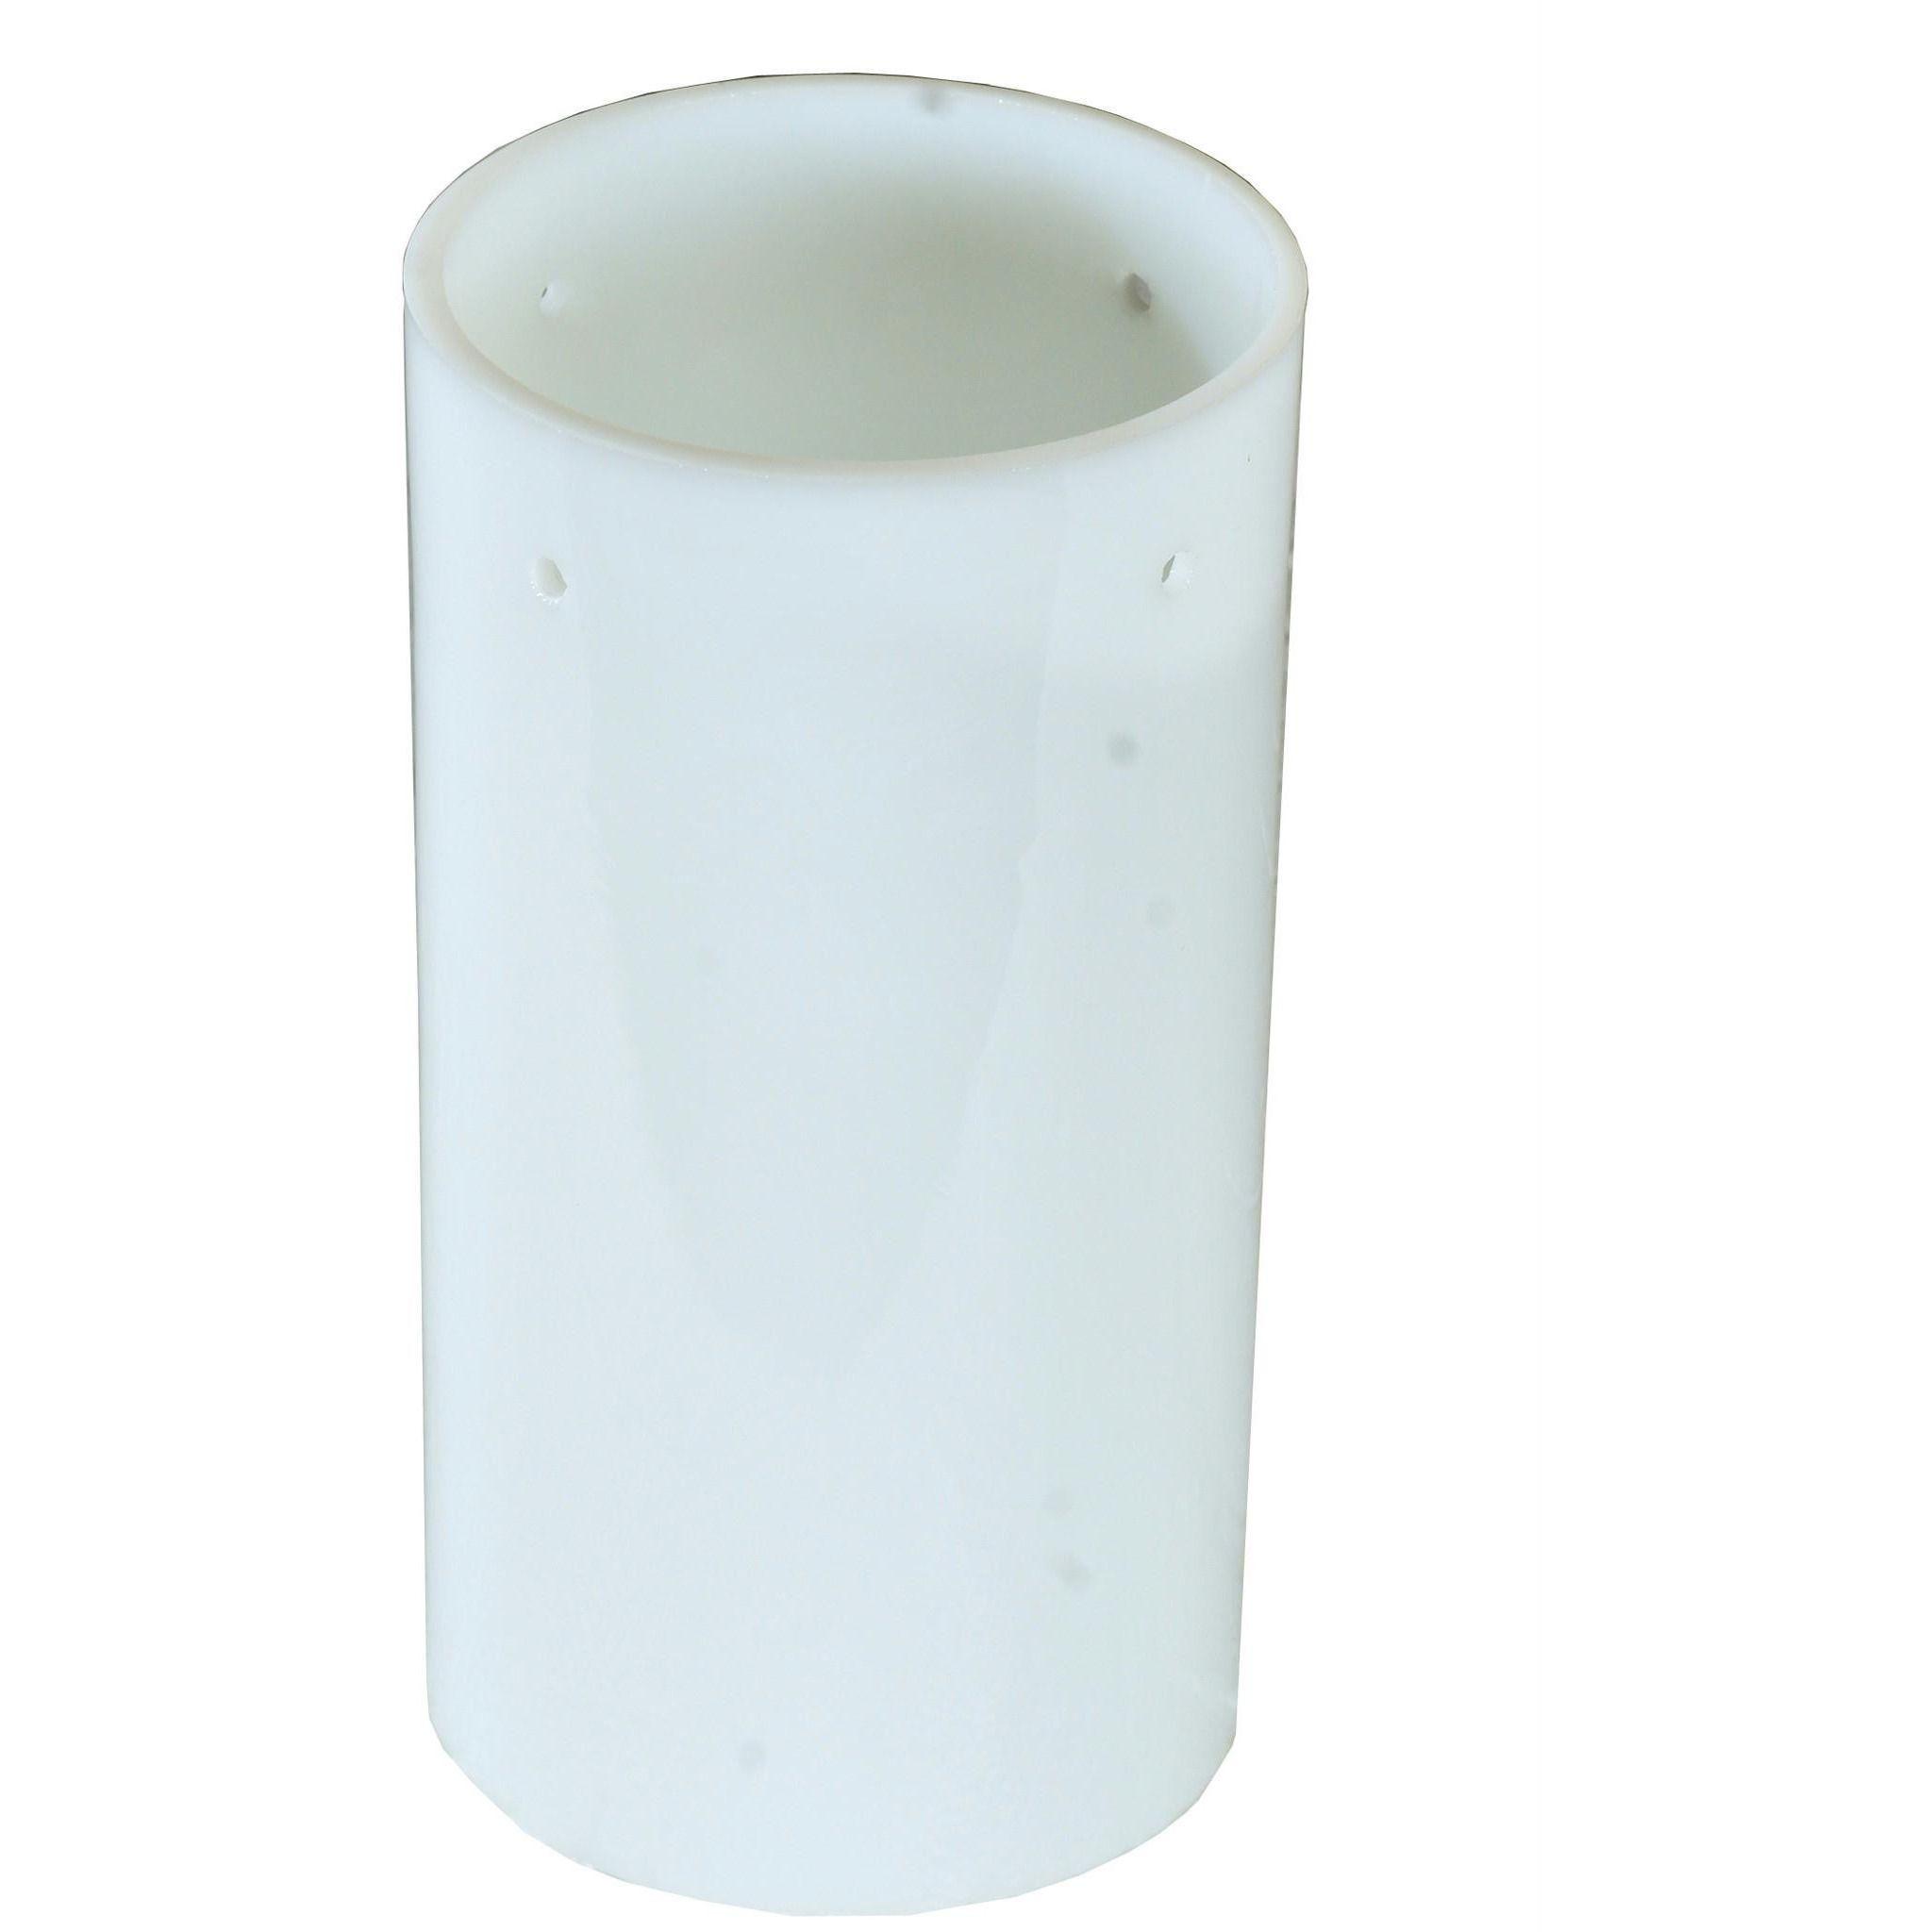 4 Inch W X 7.5 Inch H Cylinder White Shade